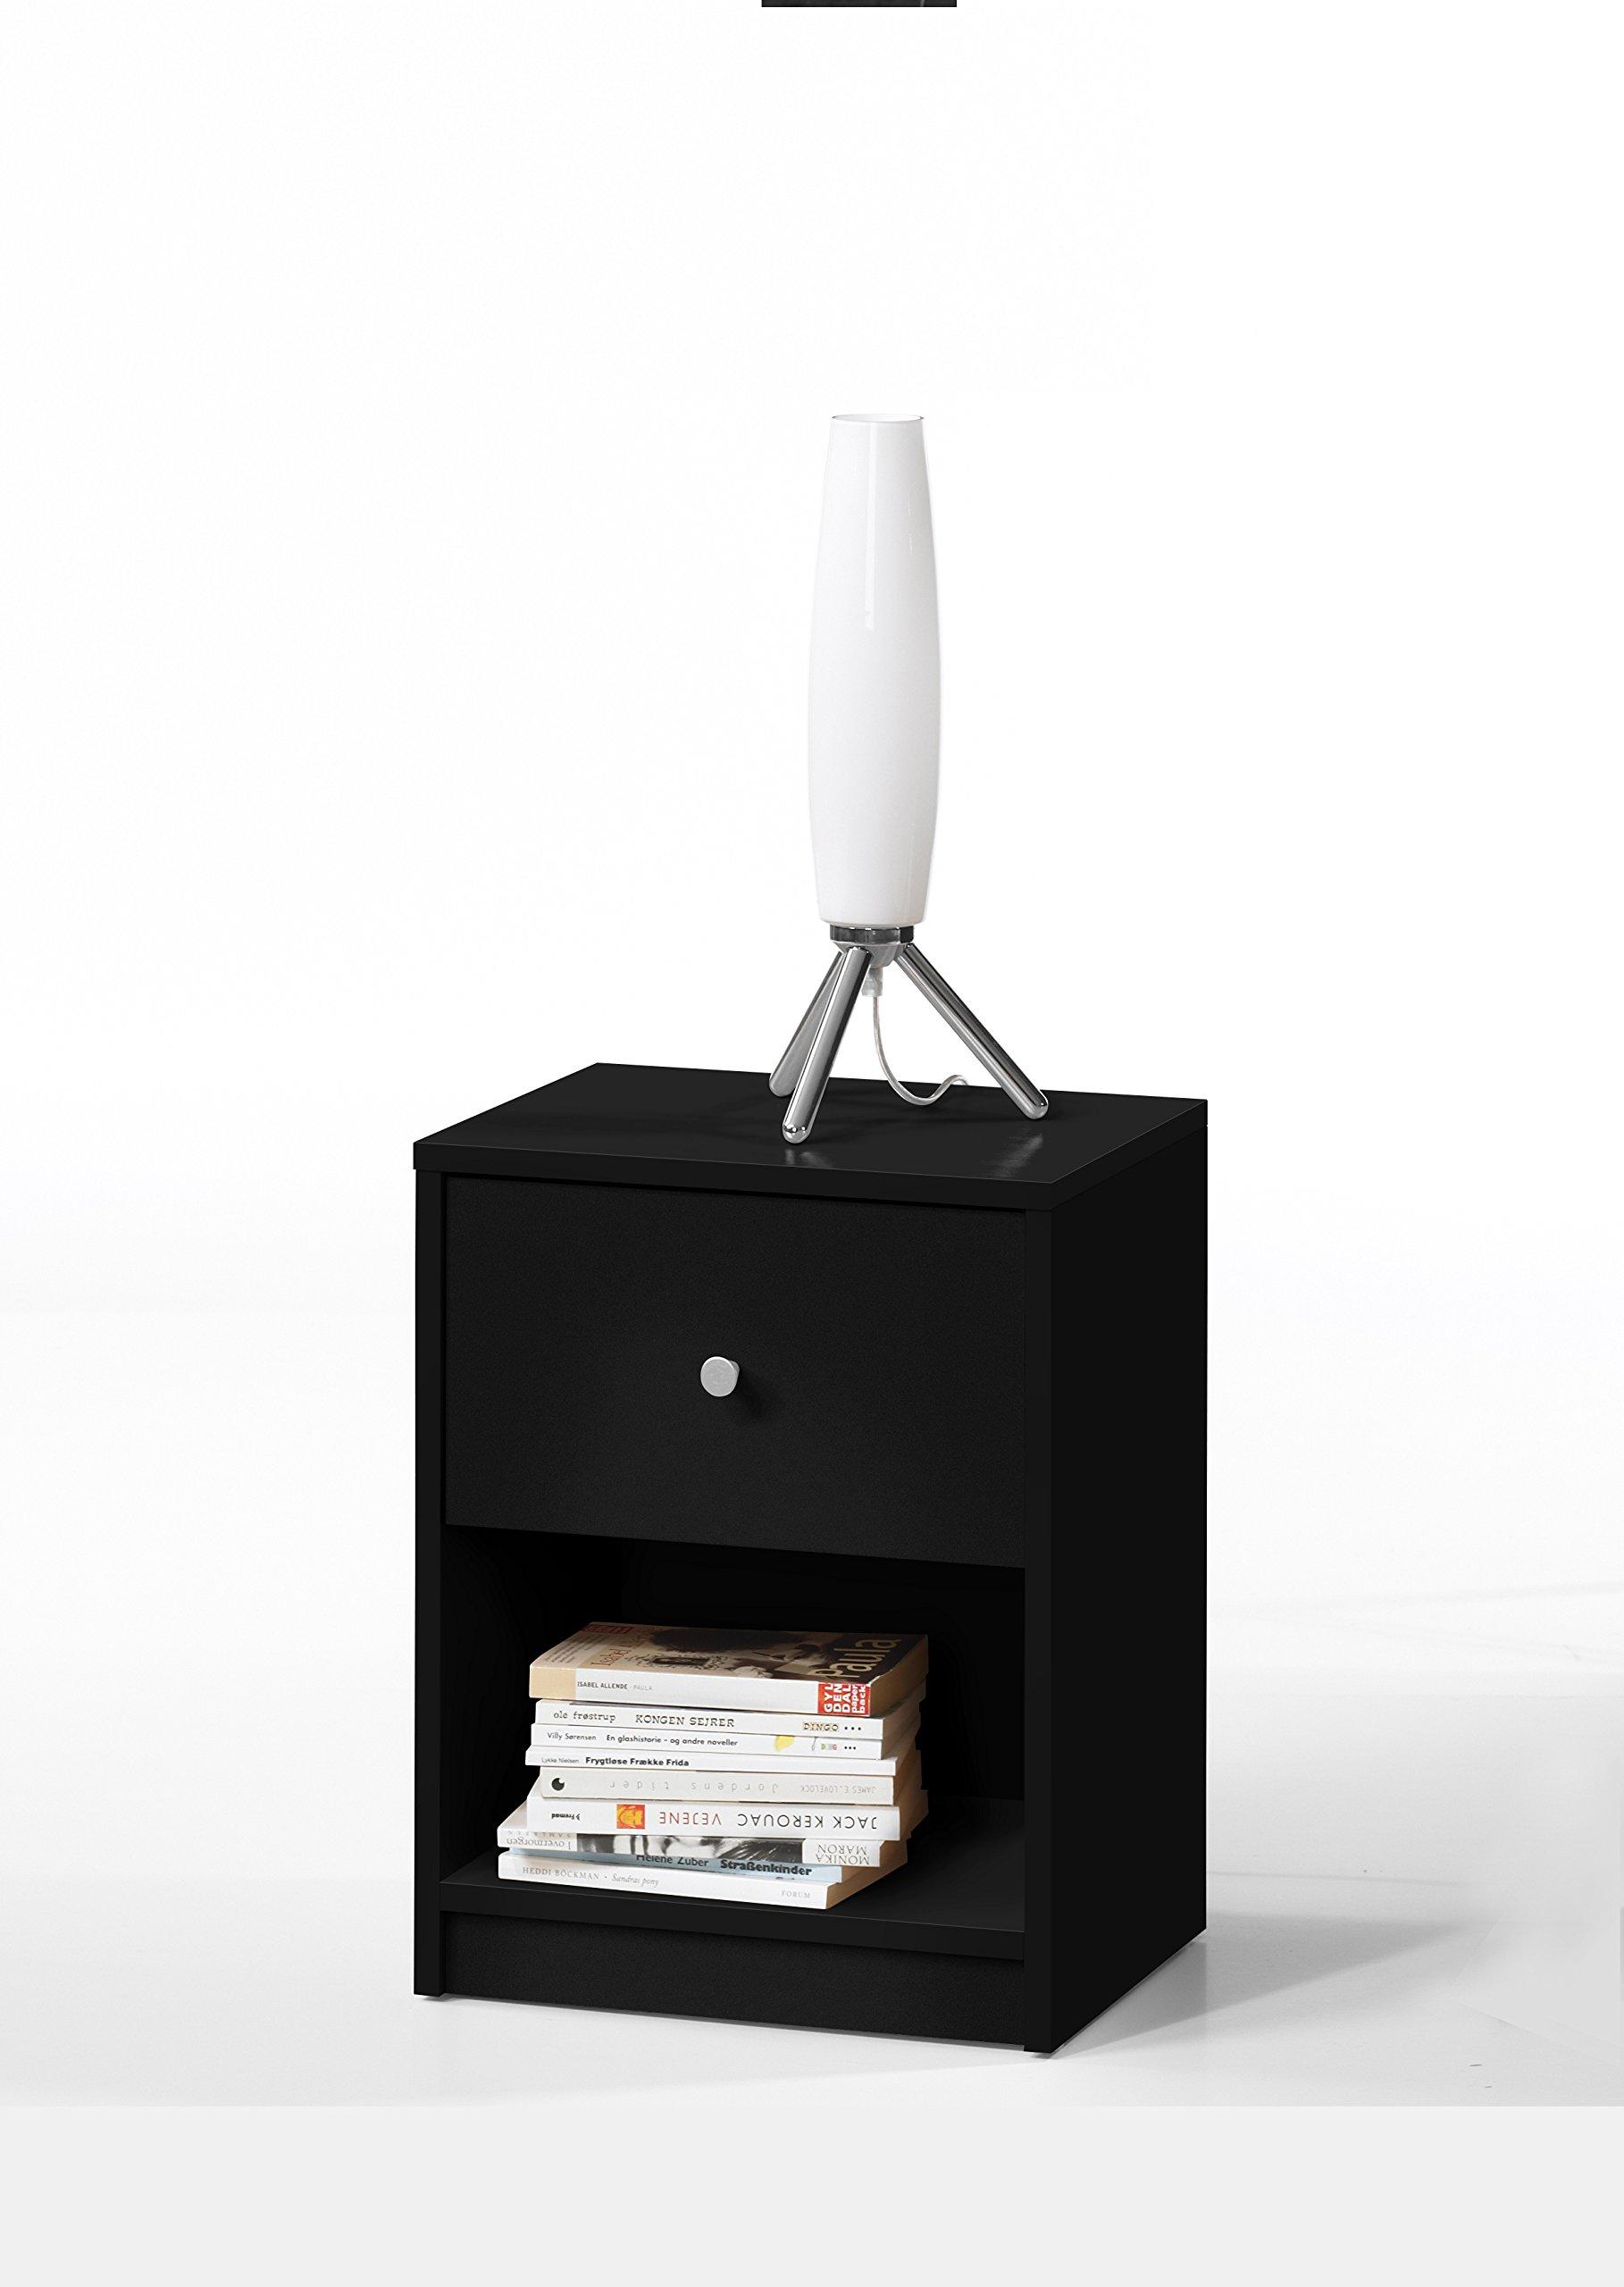 Tvilum 7033186 Portland 1 Drawer Nightstand, Black by Tvilum